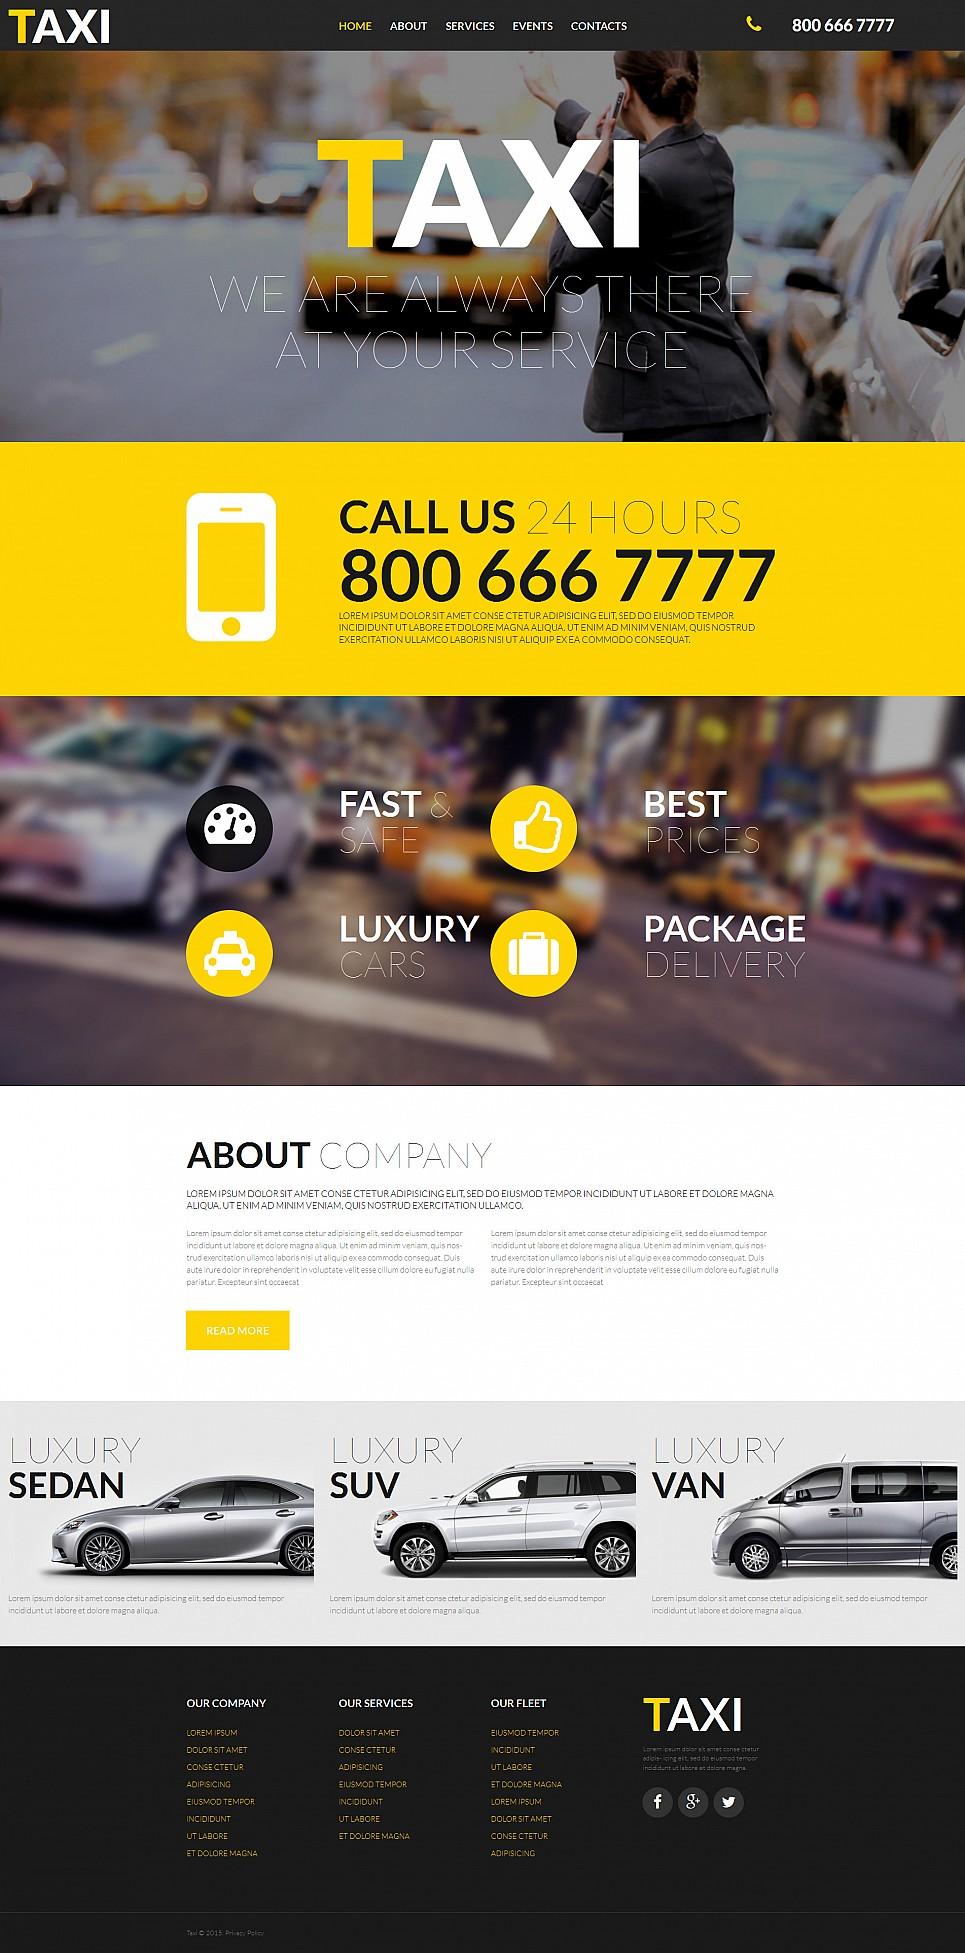 Taxi Service Company Website Design - image